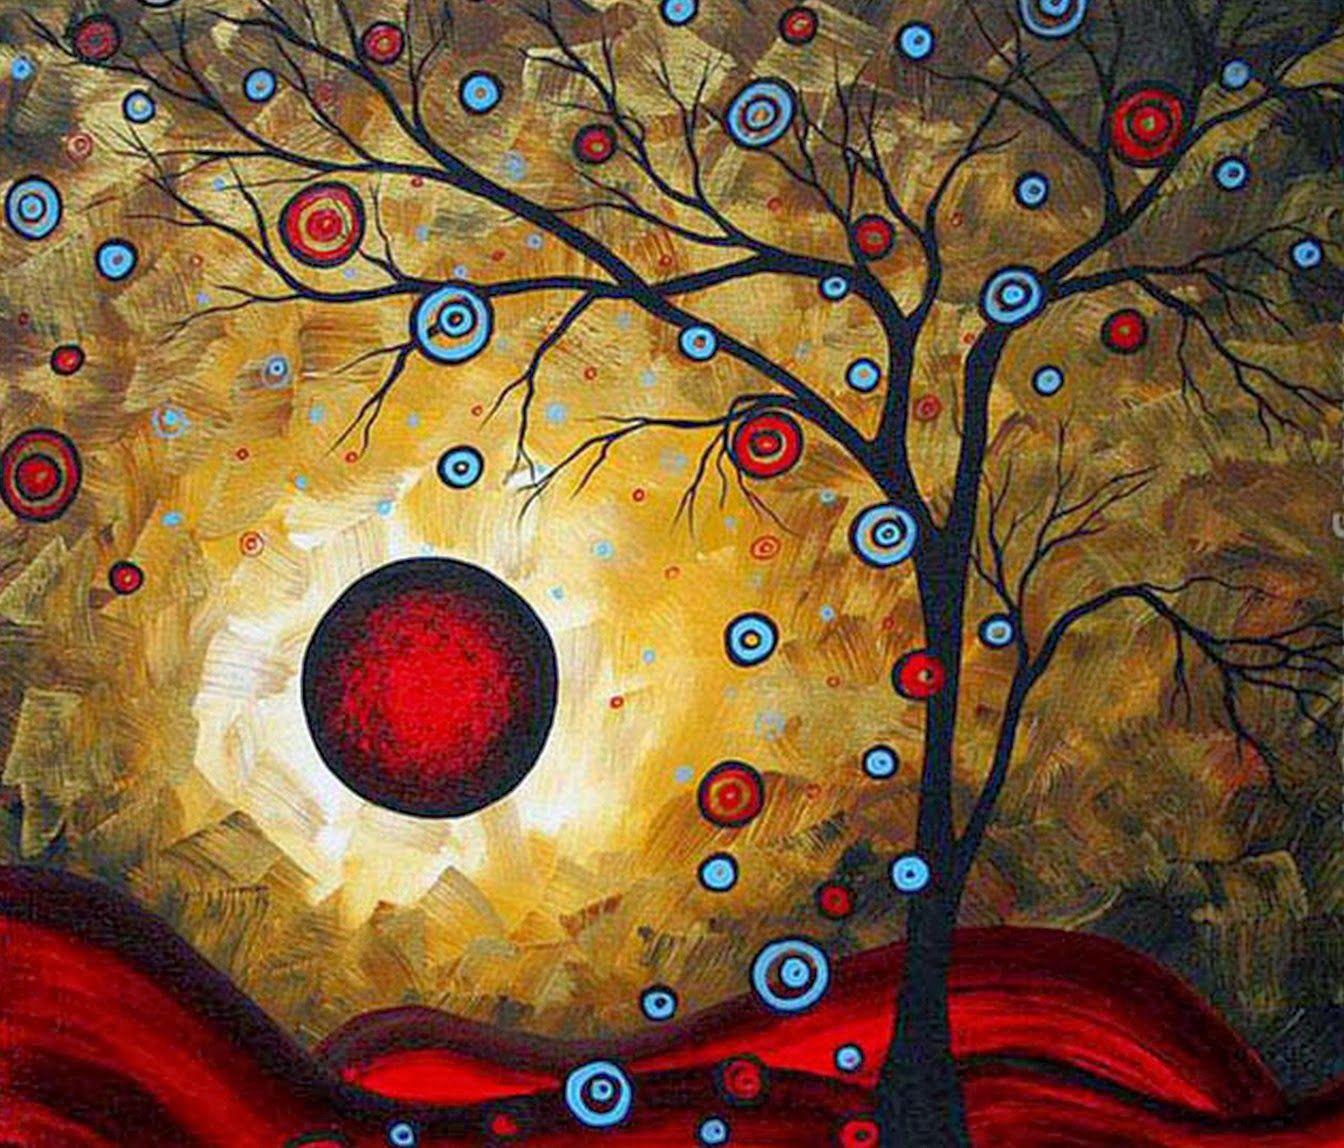 Pintura y fotograf a art stica cuadros abstractos - Fotos cuadros abstractos ...